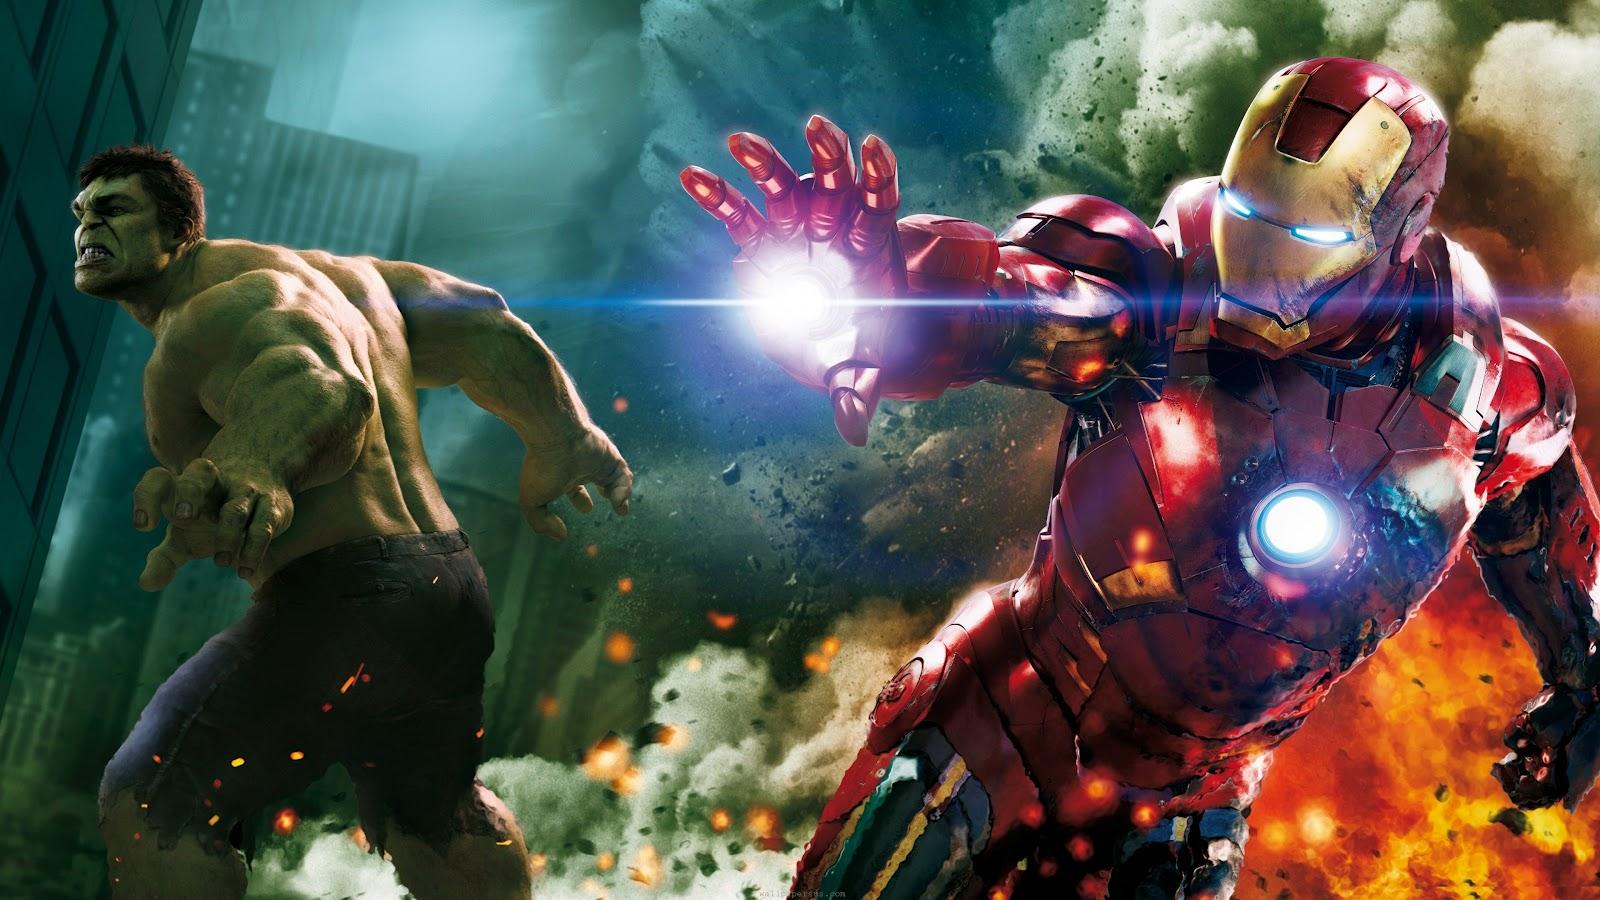 http://1.bp.blogspot.com/-Q3VR0R0Fhd4/T6k9nNoP5xI/AAAAAAAAF-o/wmJEk6CYtqg/s1600/iron-man-superheroes-the-avengers-hulk-marvel-iron-man3.jpg